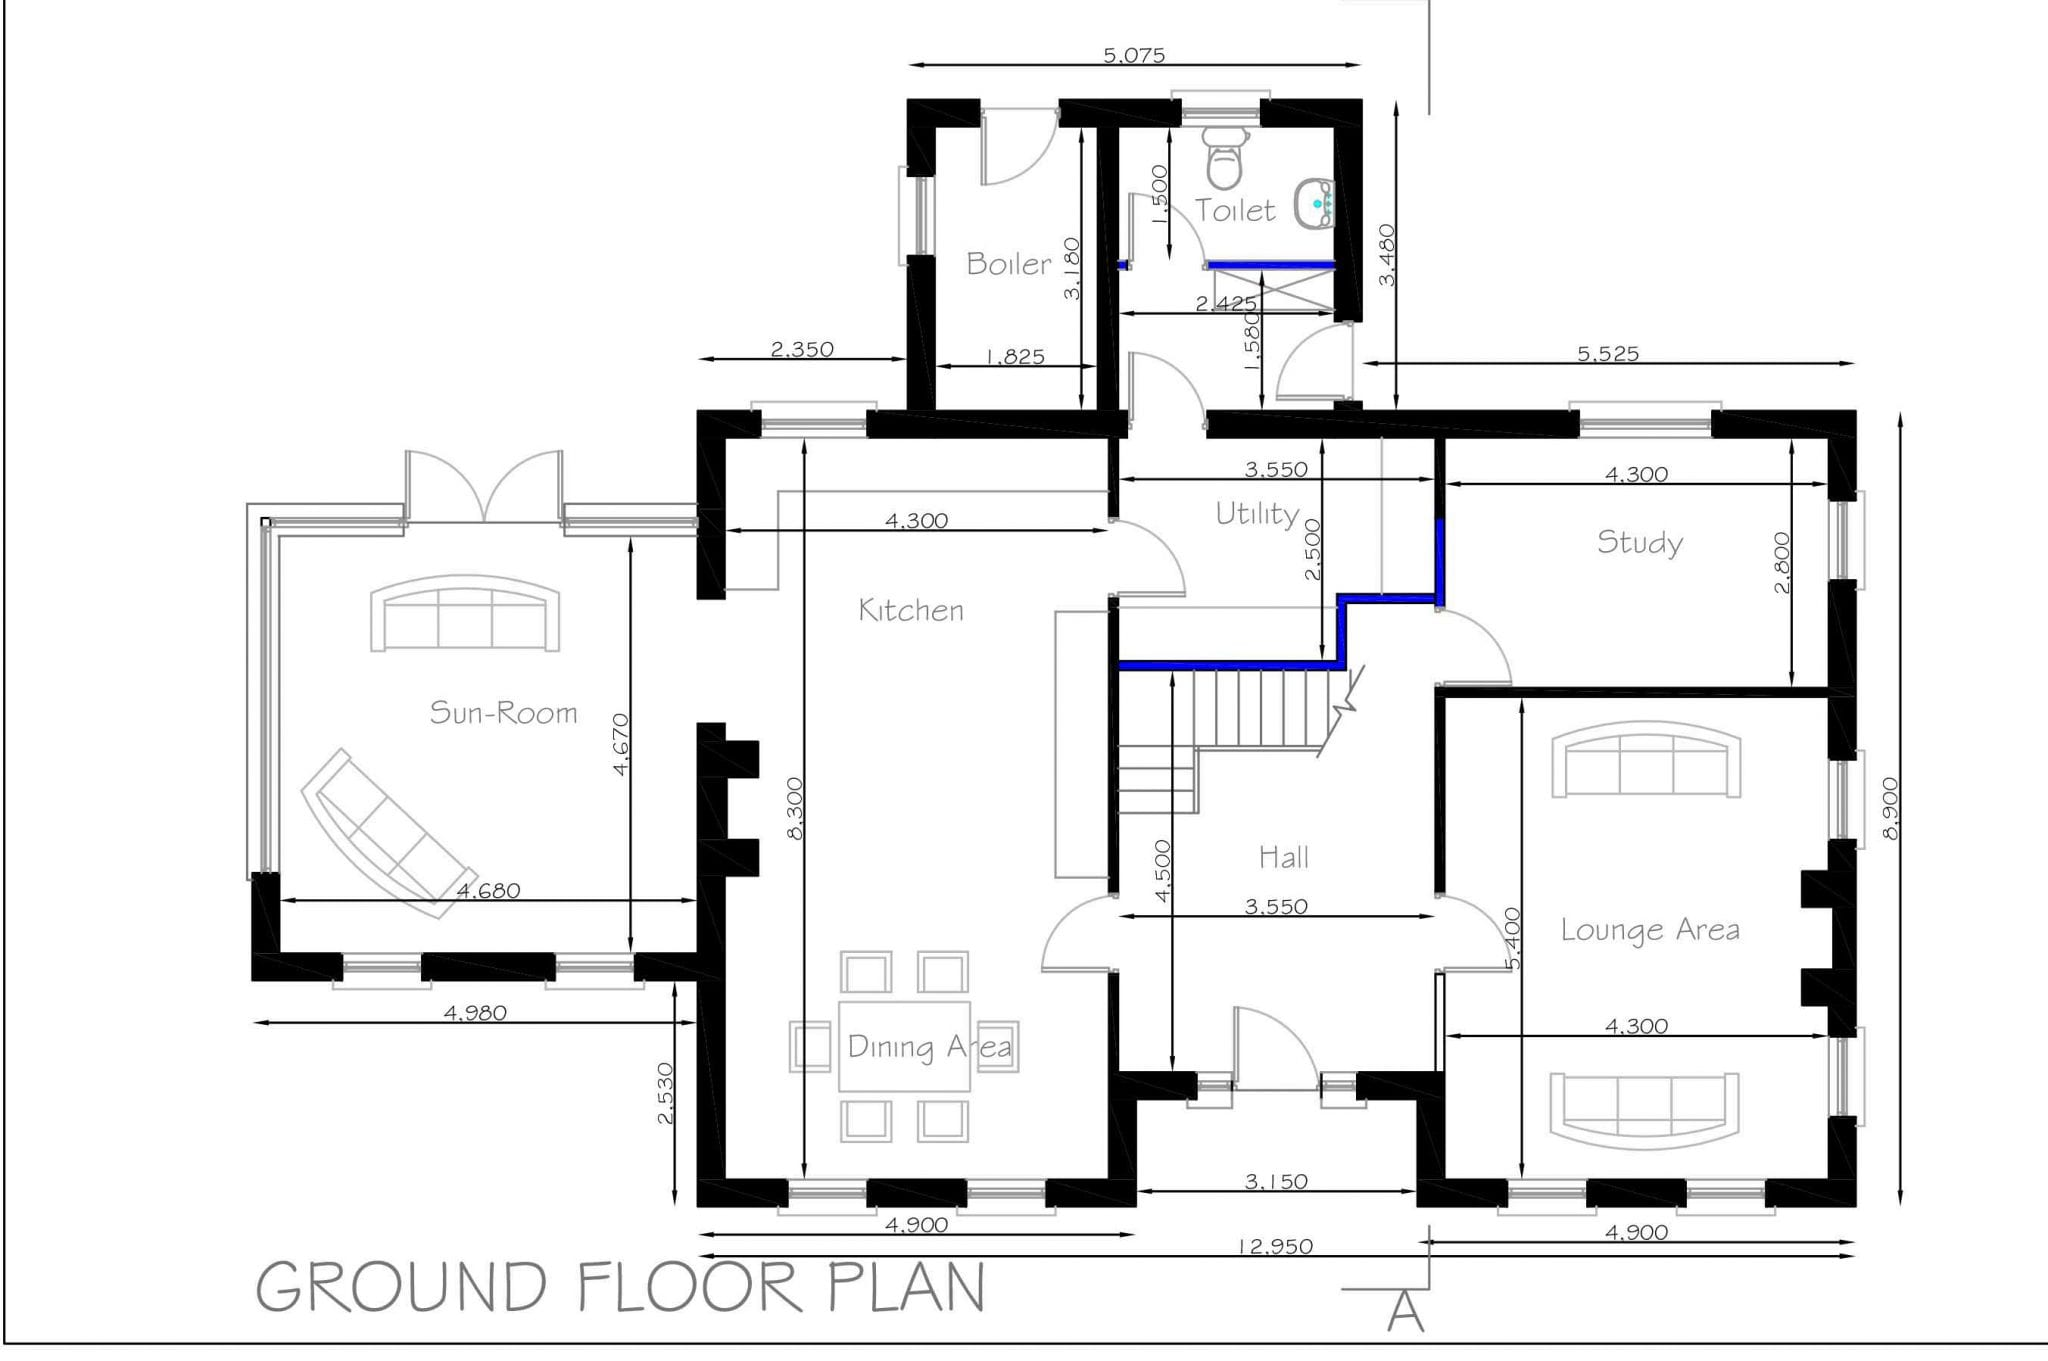 1766-Don Murphy Ground Floor